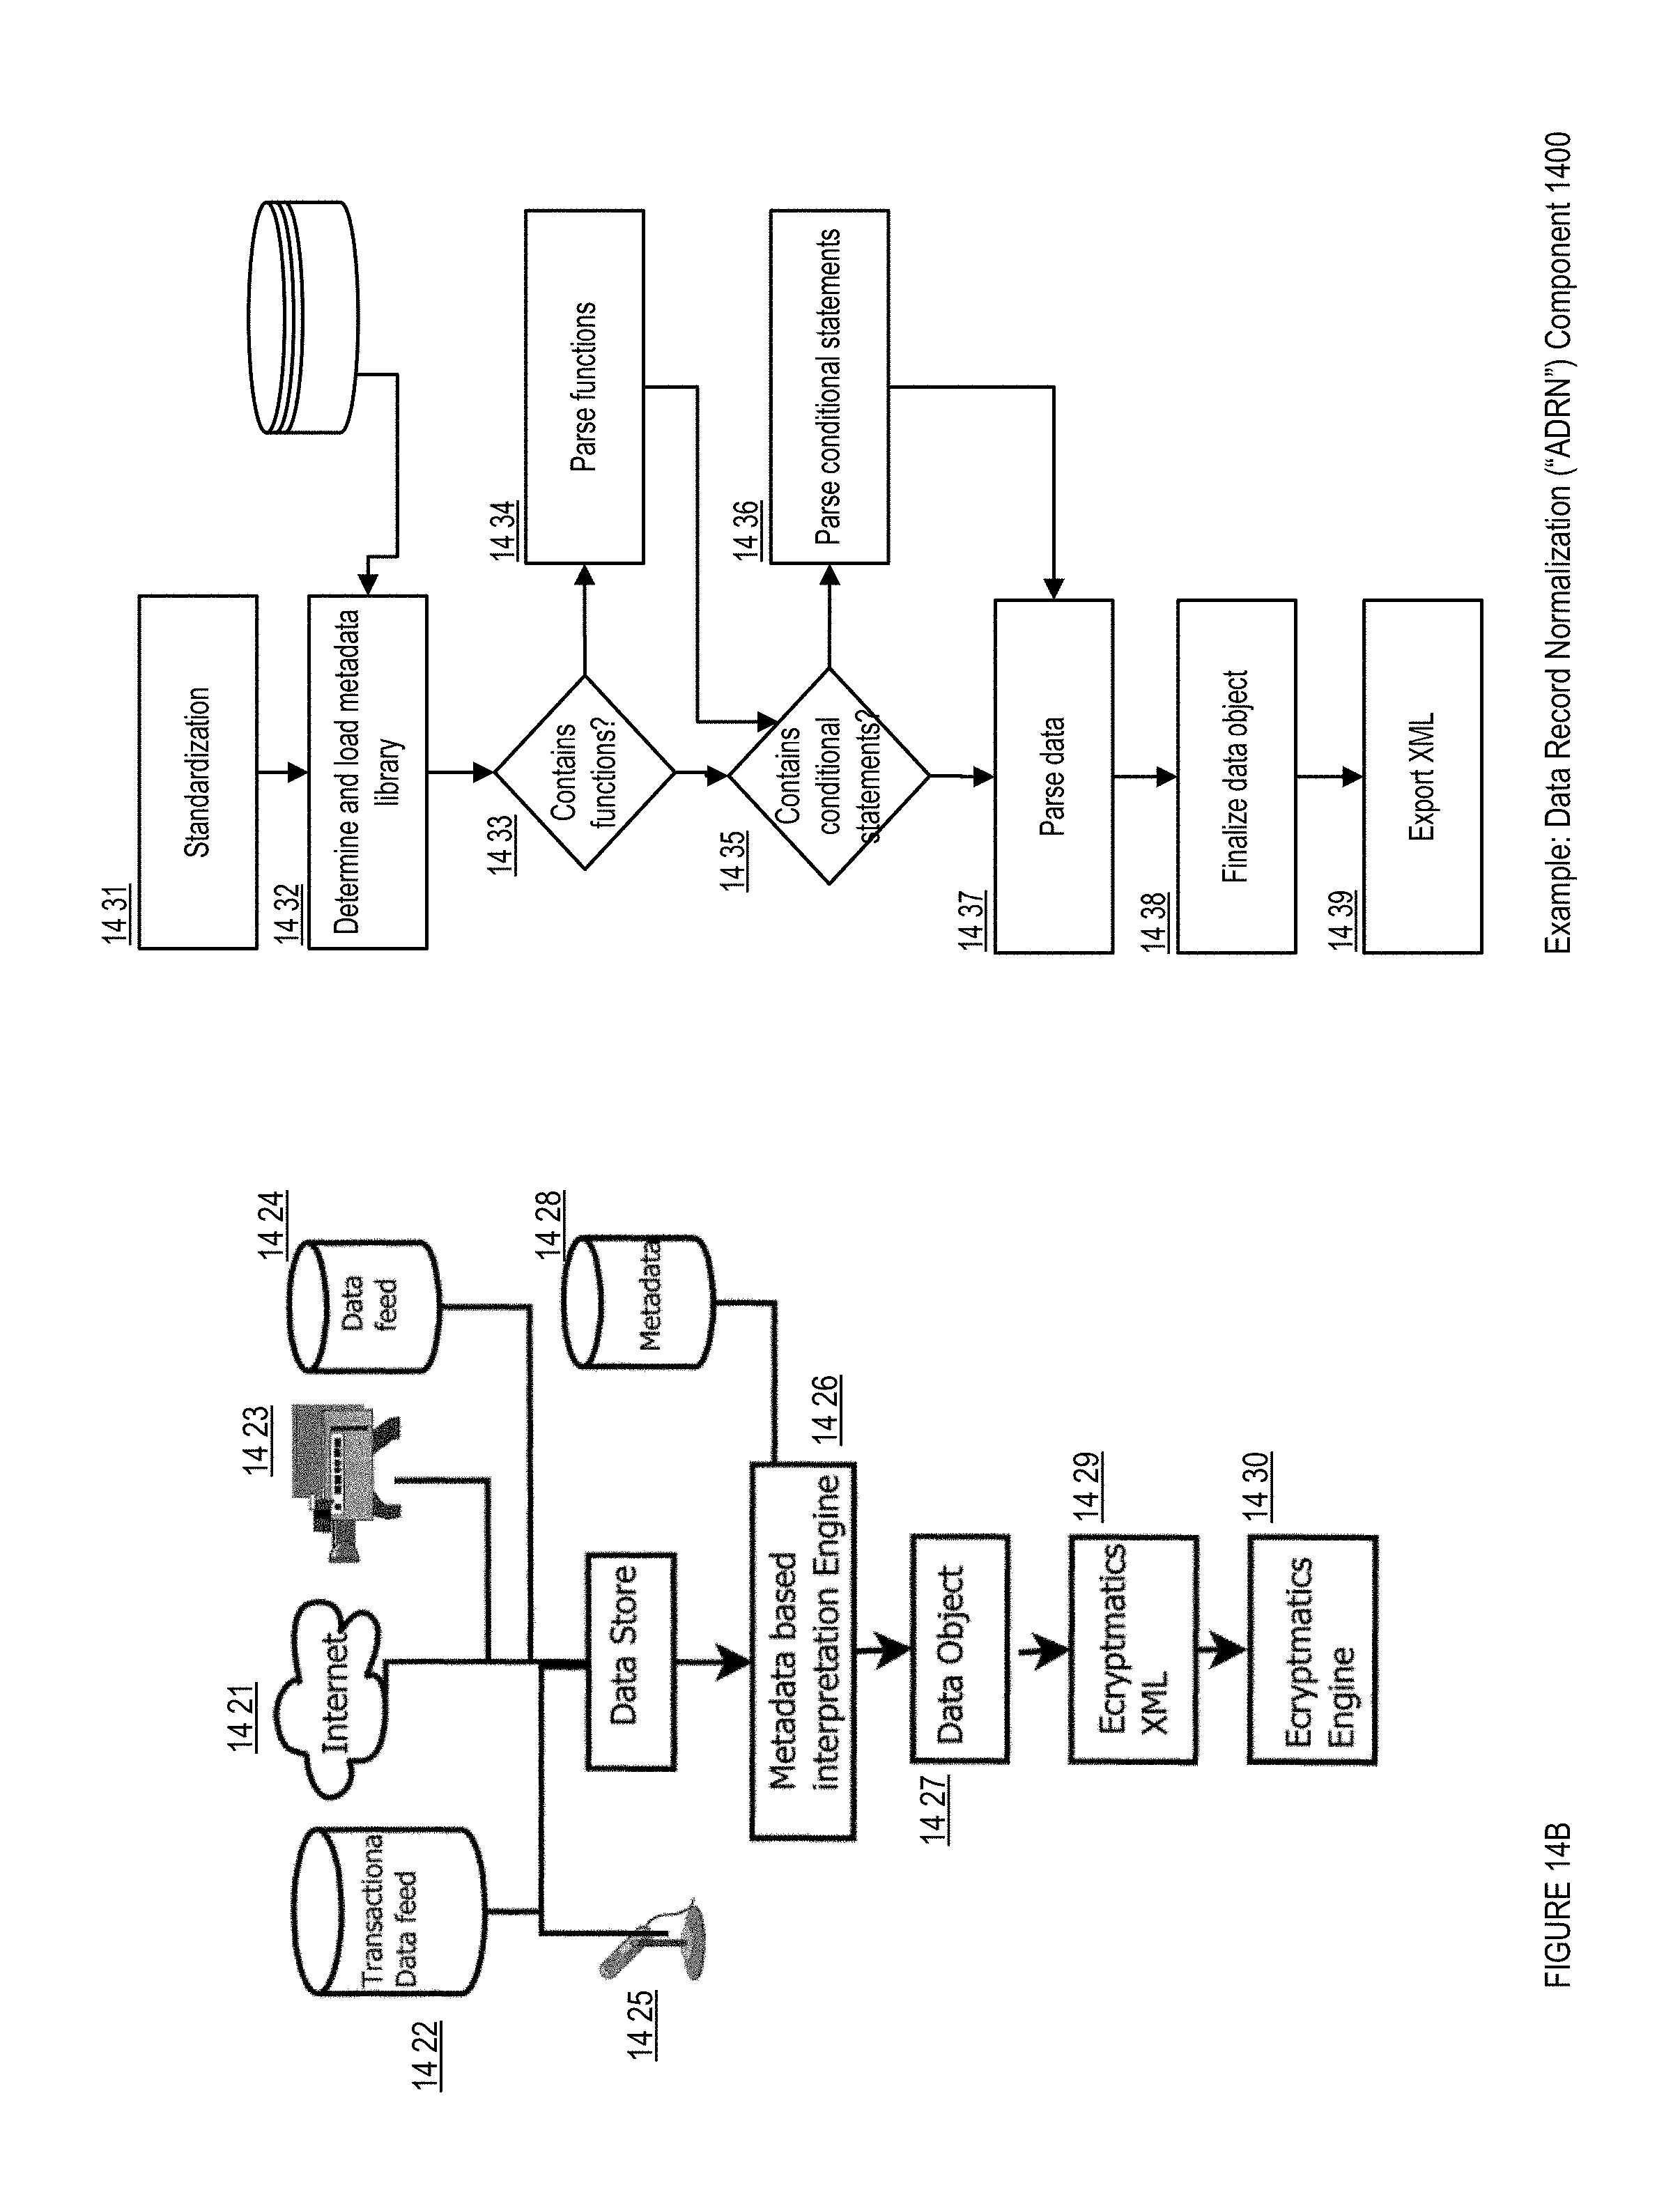 Patent Us 9830328 B2 Toshiba 1600 Xp Wiring Diagram Images